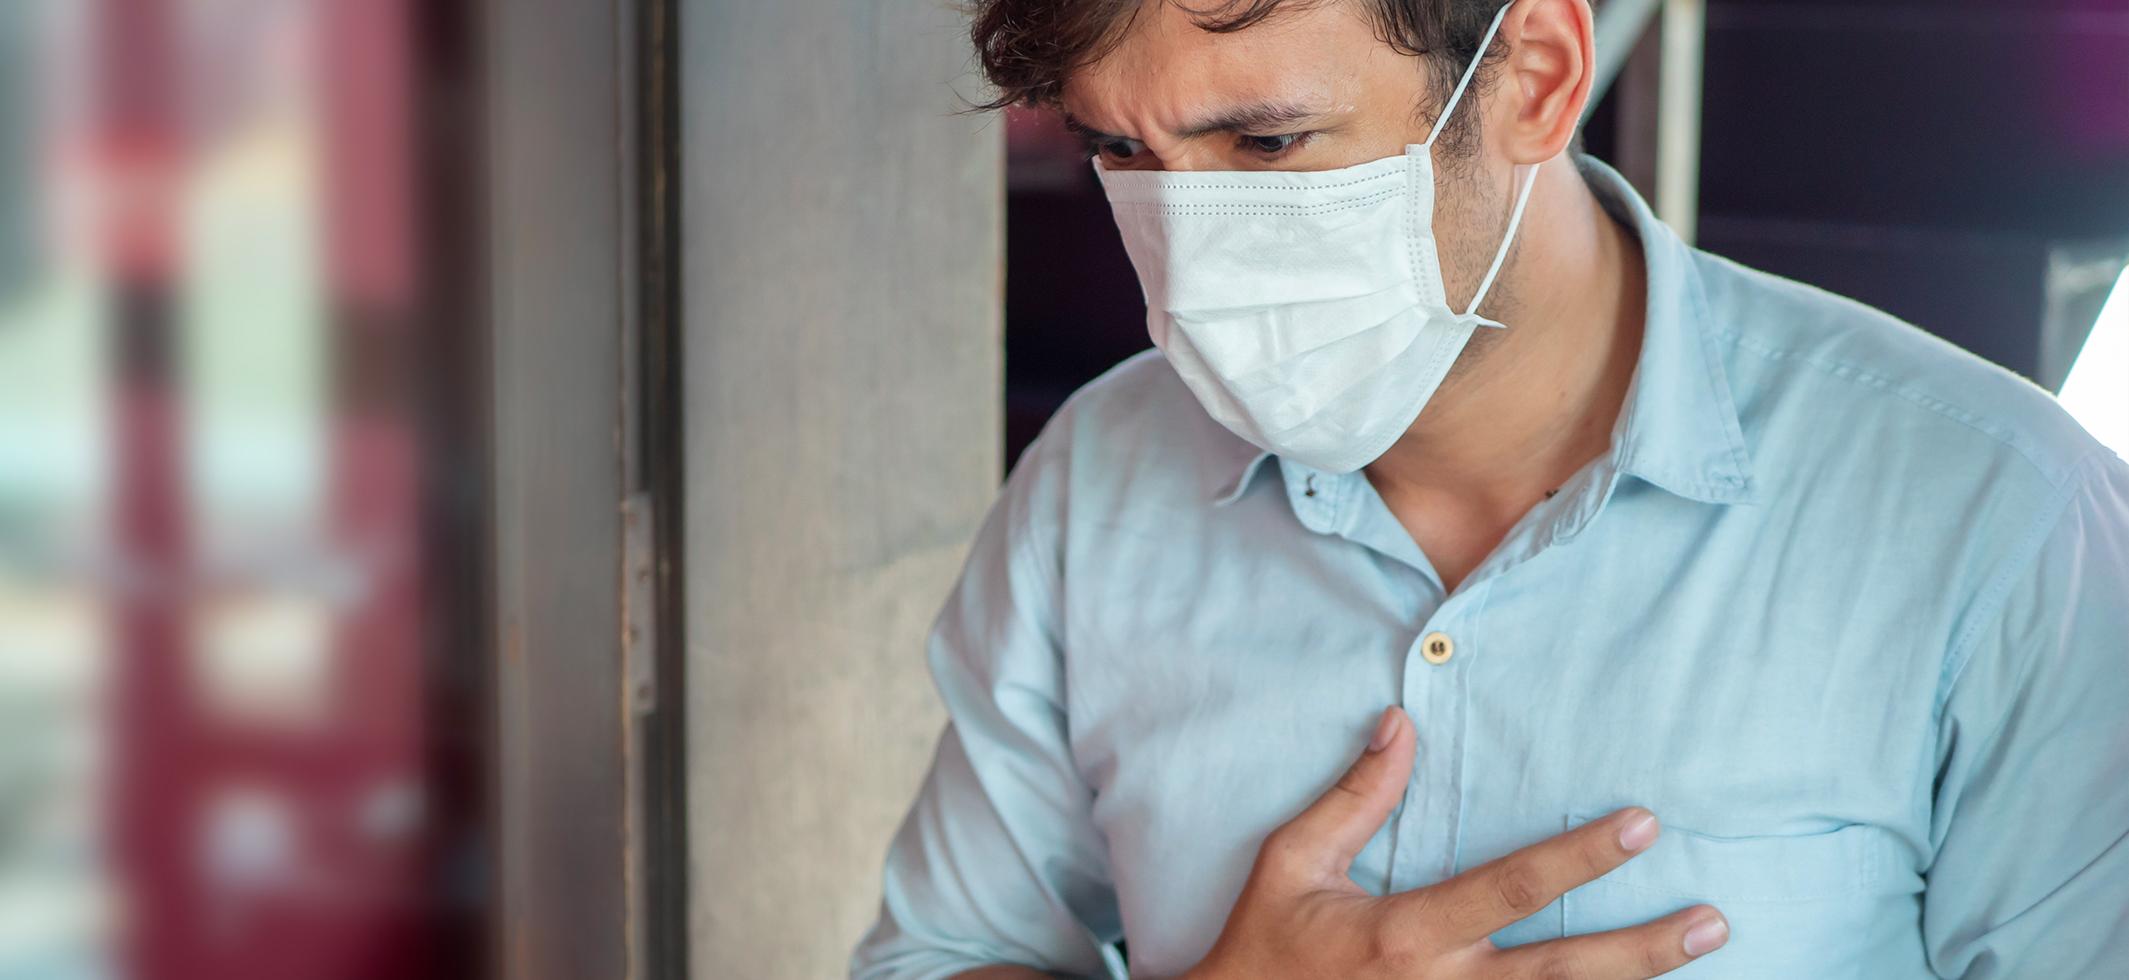 sindrome-da-distress-respiratrio-acuto